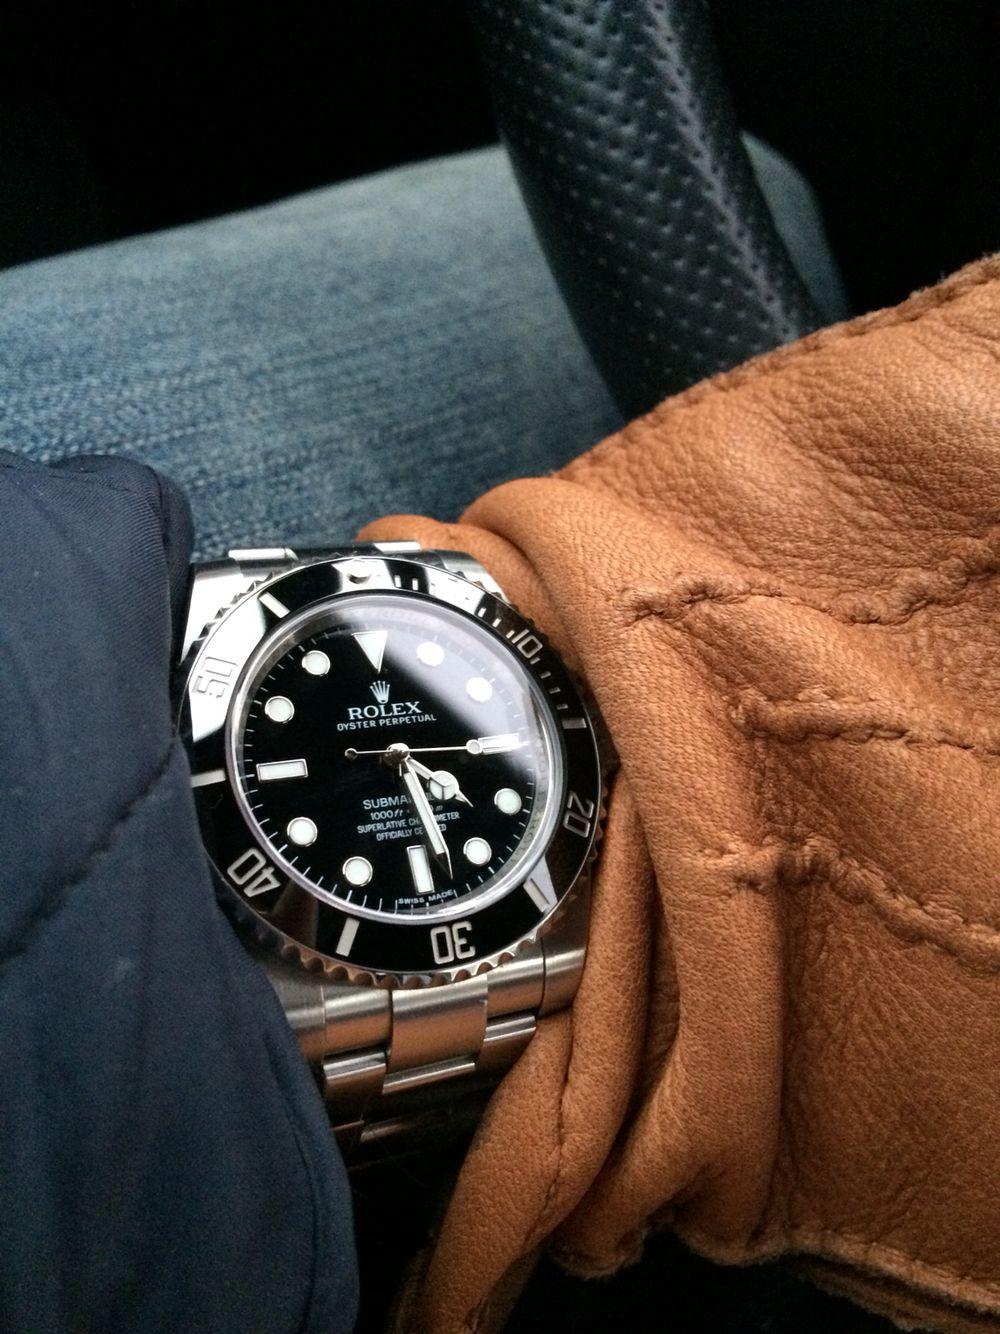 RelojReloj Del Ref Submariner 114060Outfits Y Rolex Mundo ZuOXwPkiT